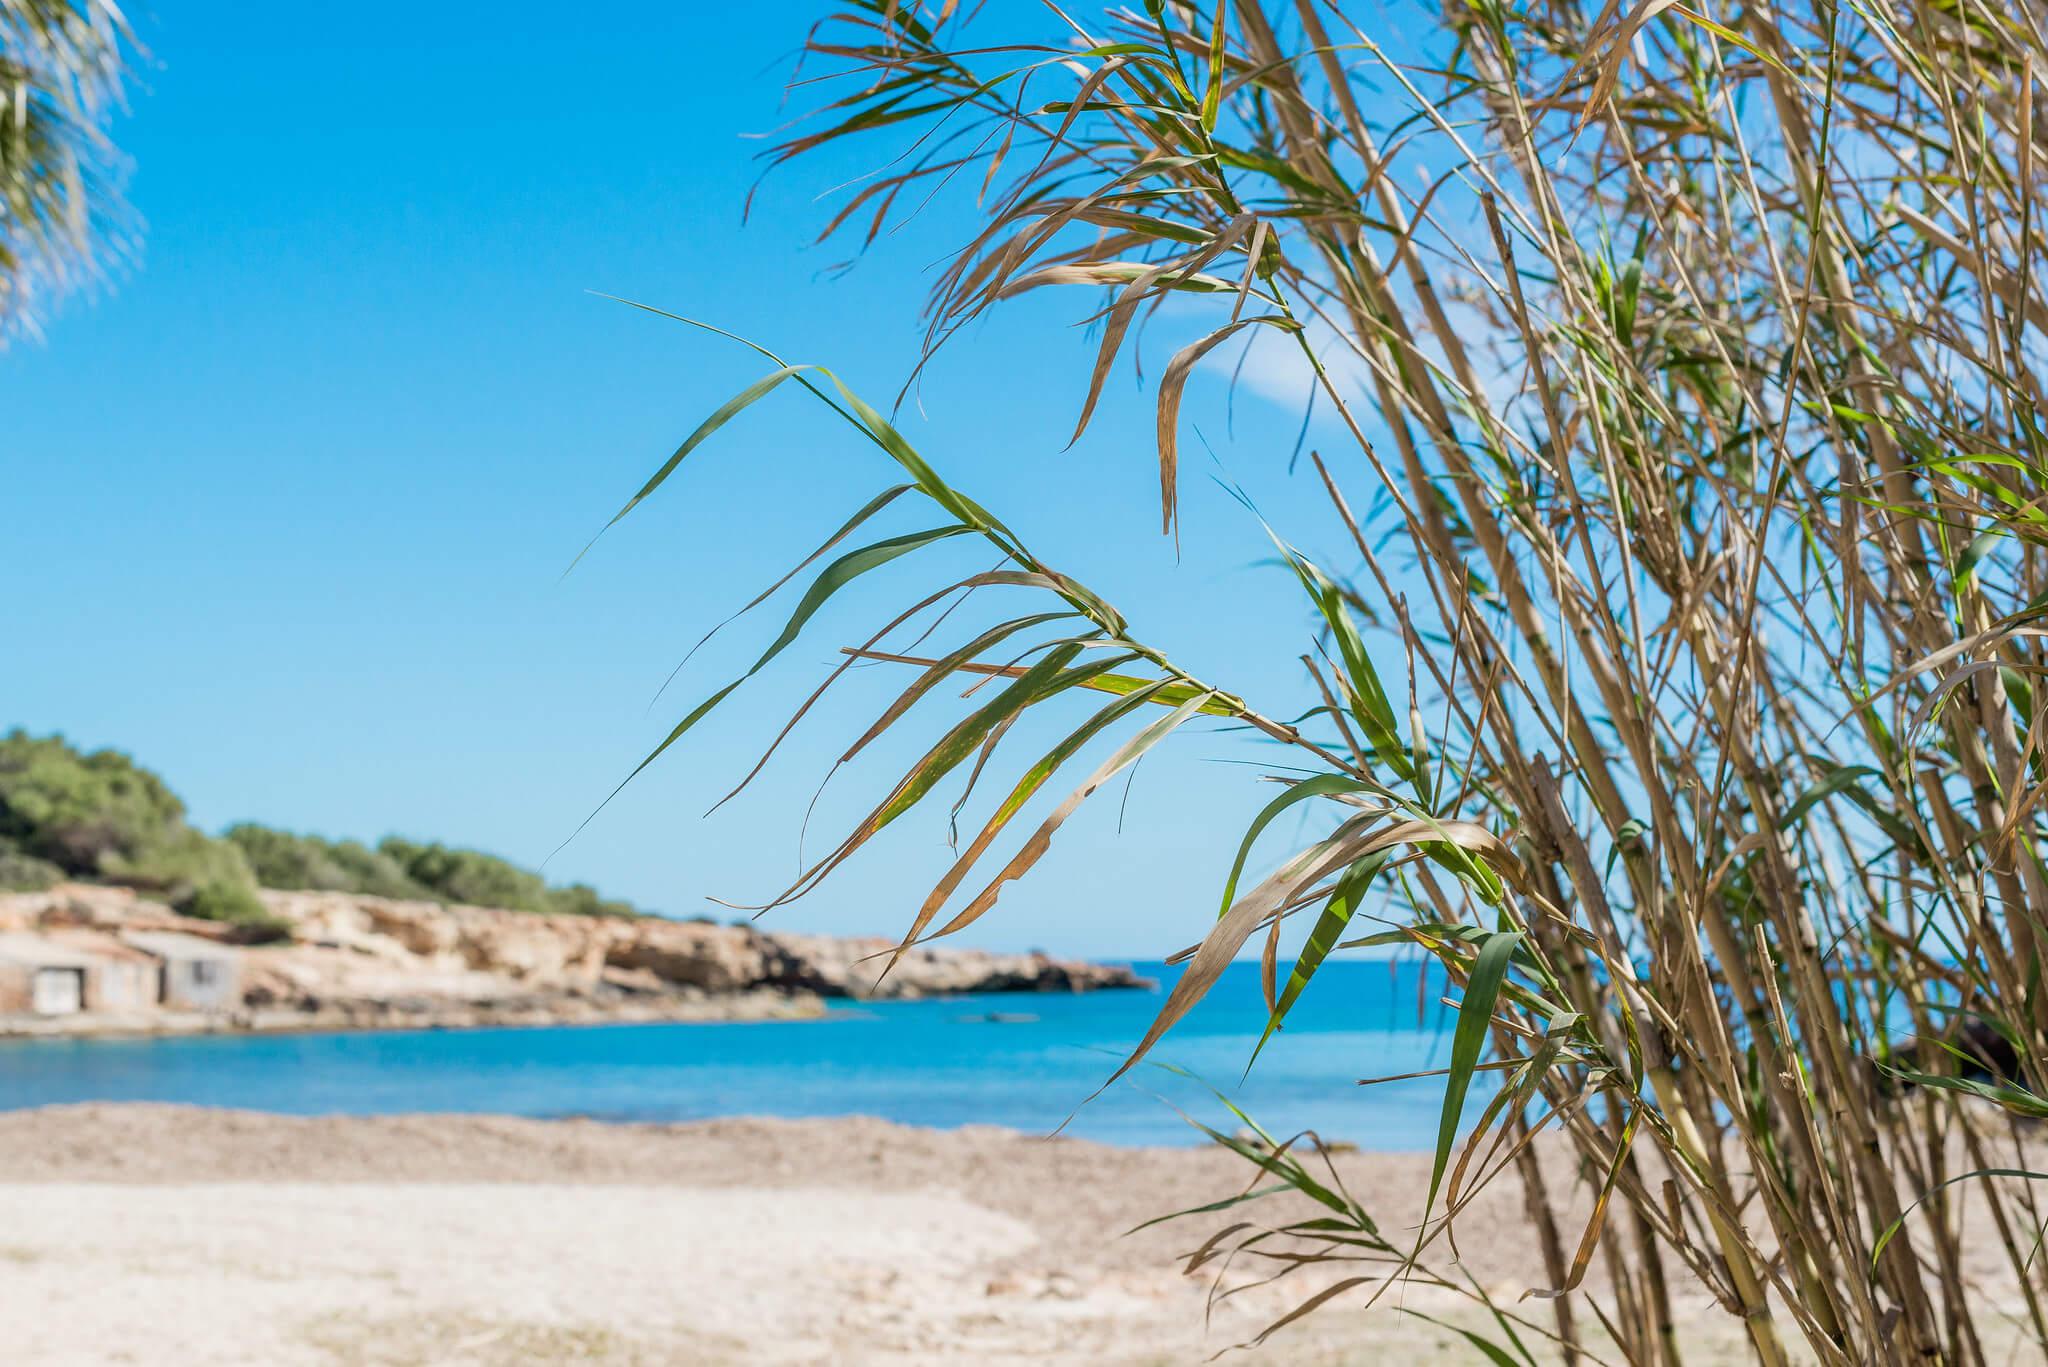 https://www.white-ibiza.com/wp-content/uploads/2020/03/ibiza-beaches-sestanyol-02.jpg